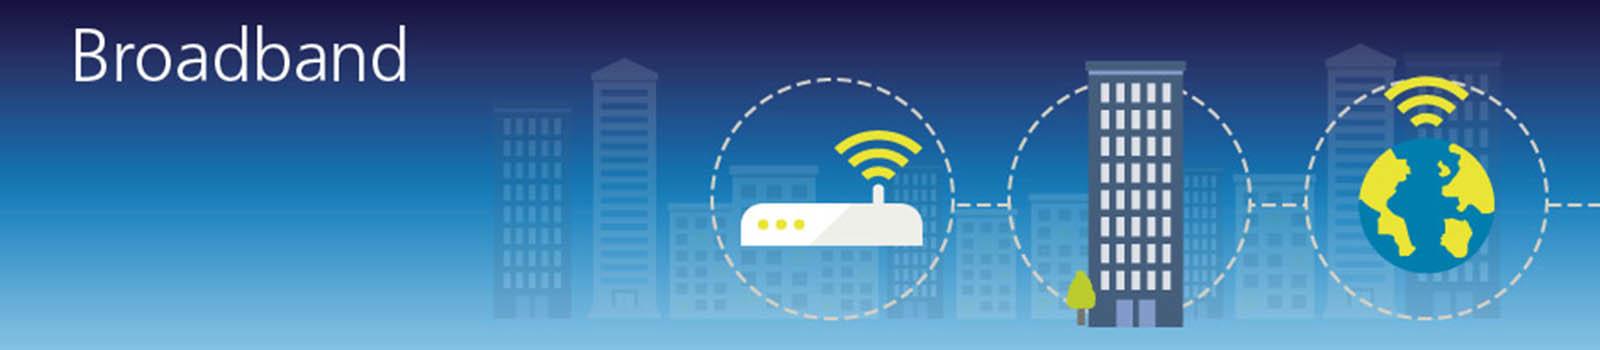 Zeonet Broadband